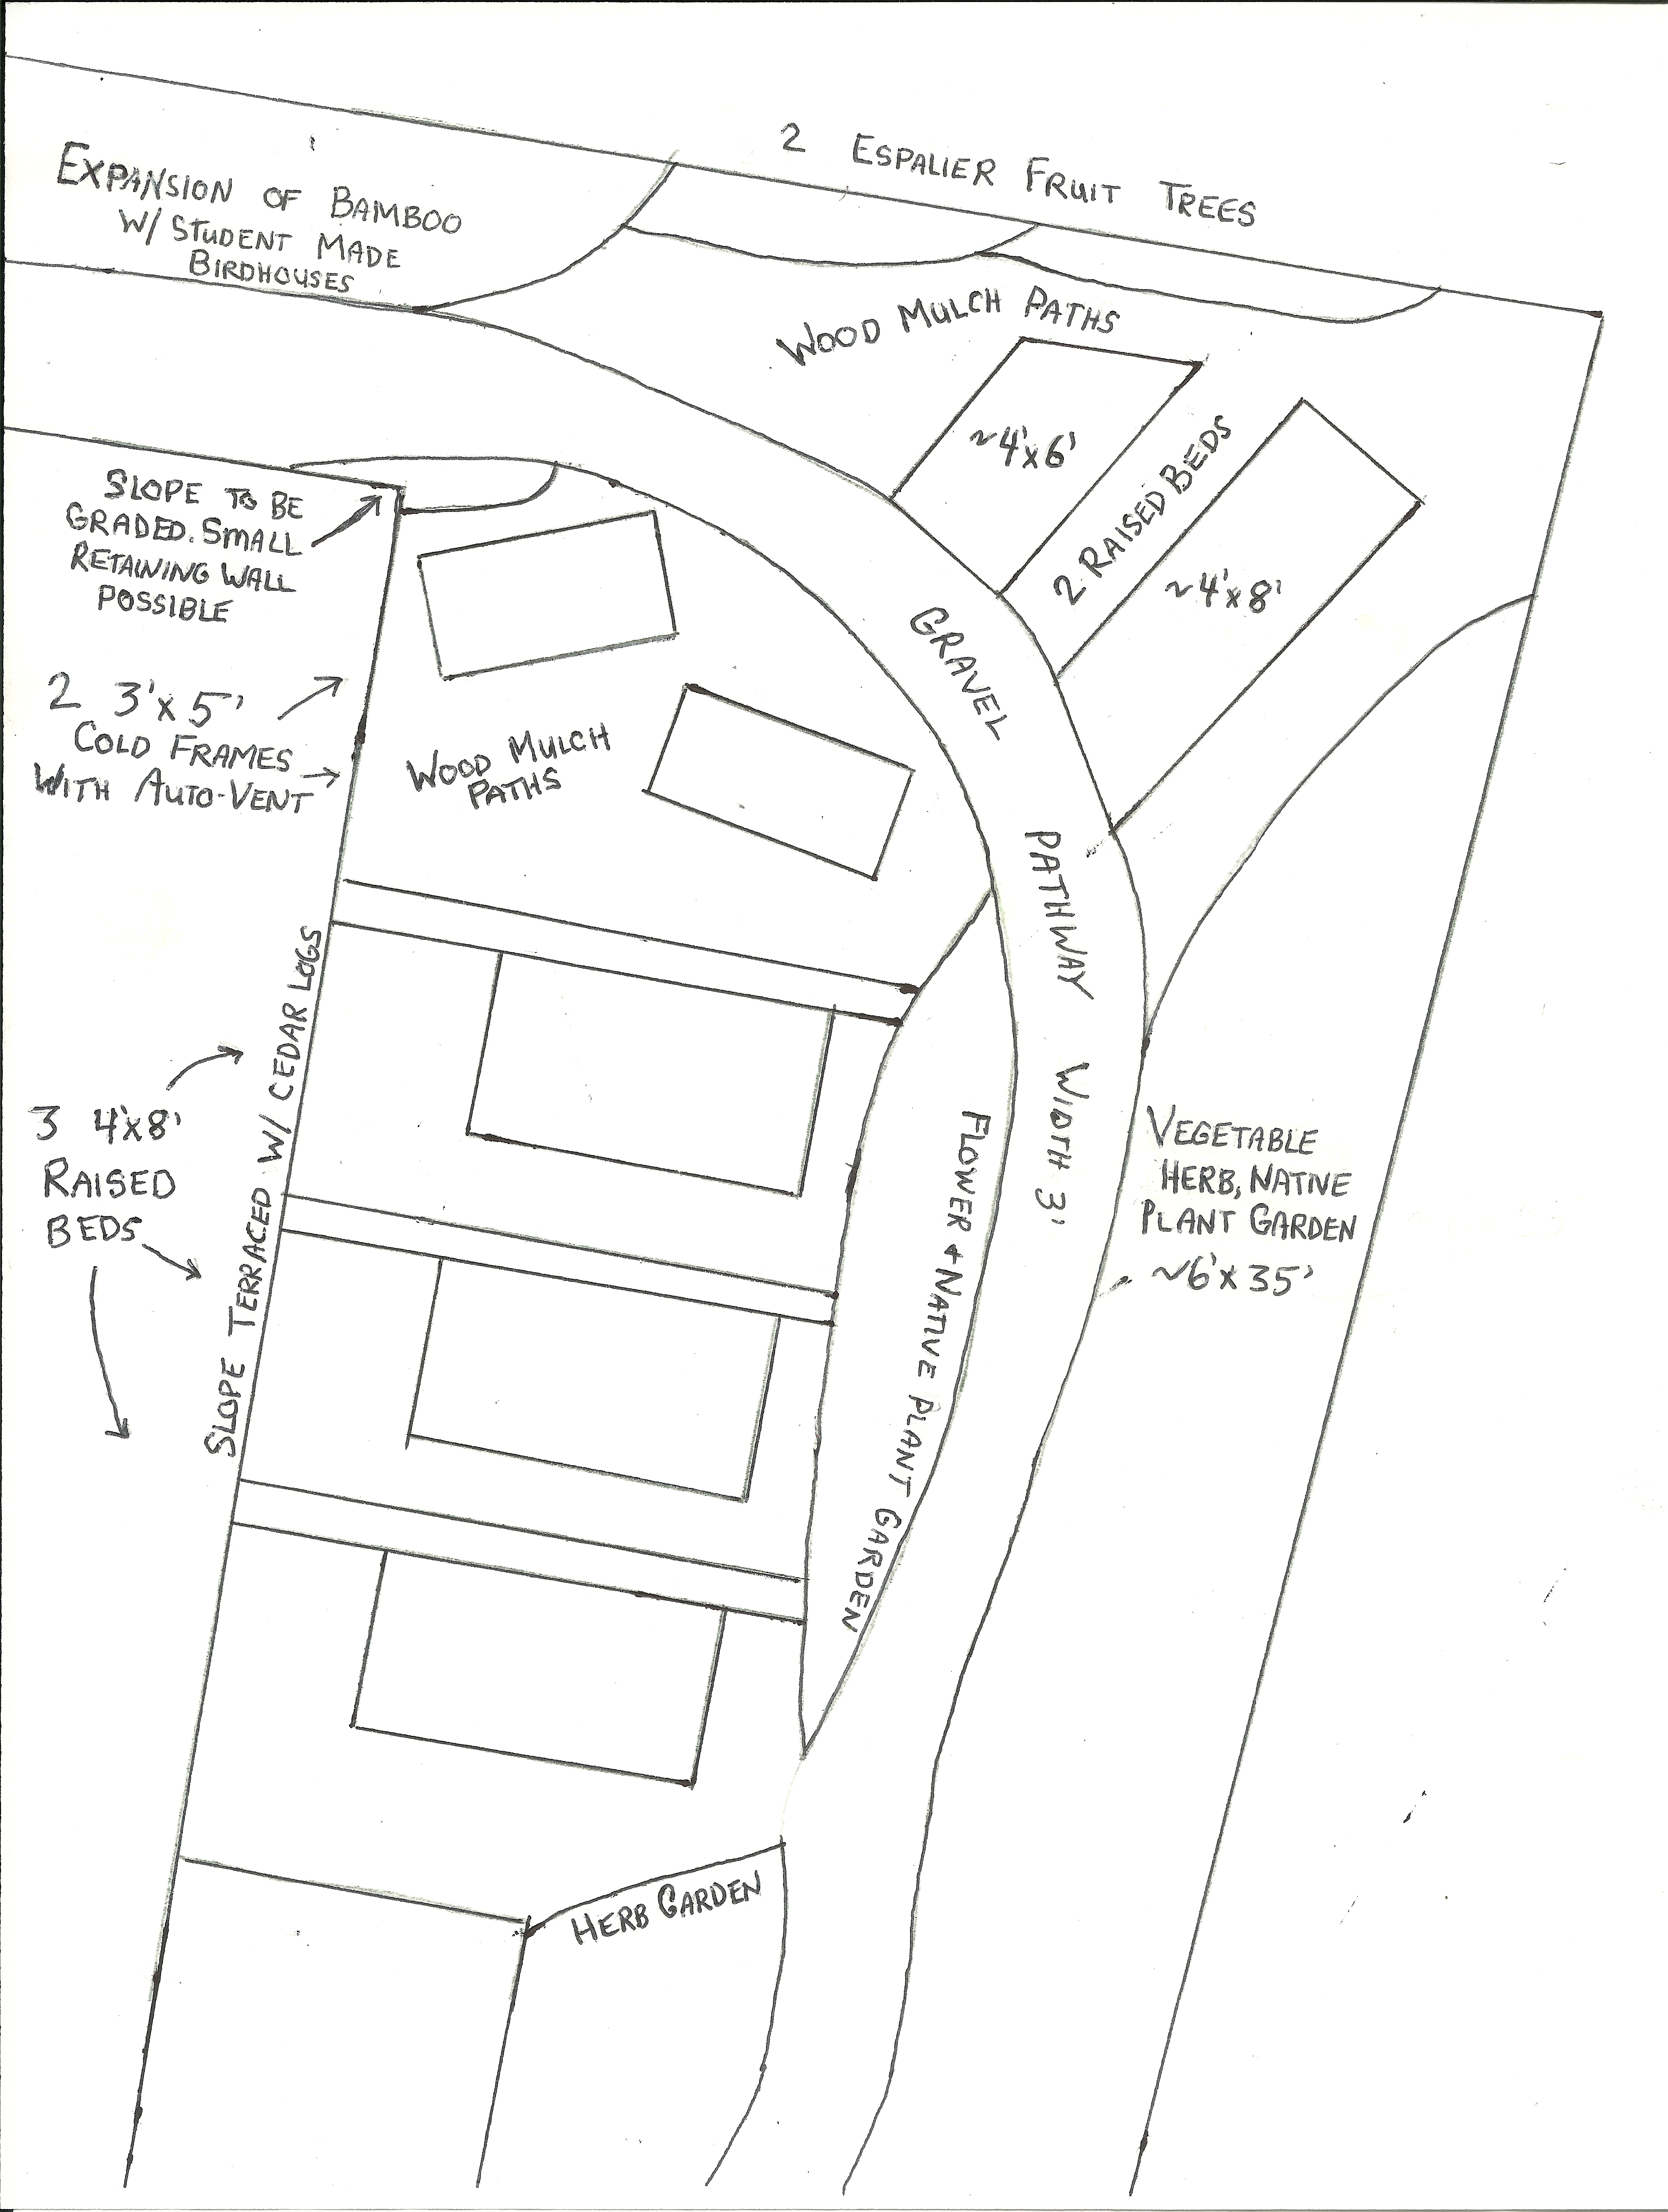 School garden design drawing - School Garden Design University City Mo